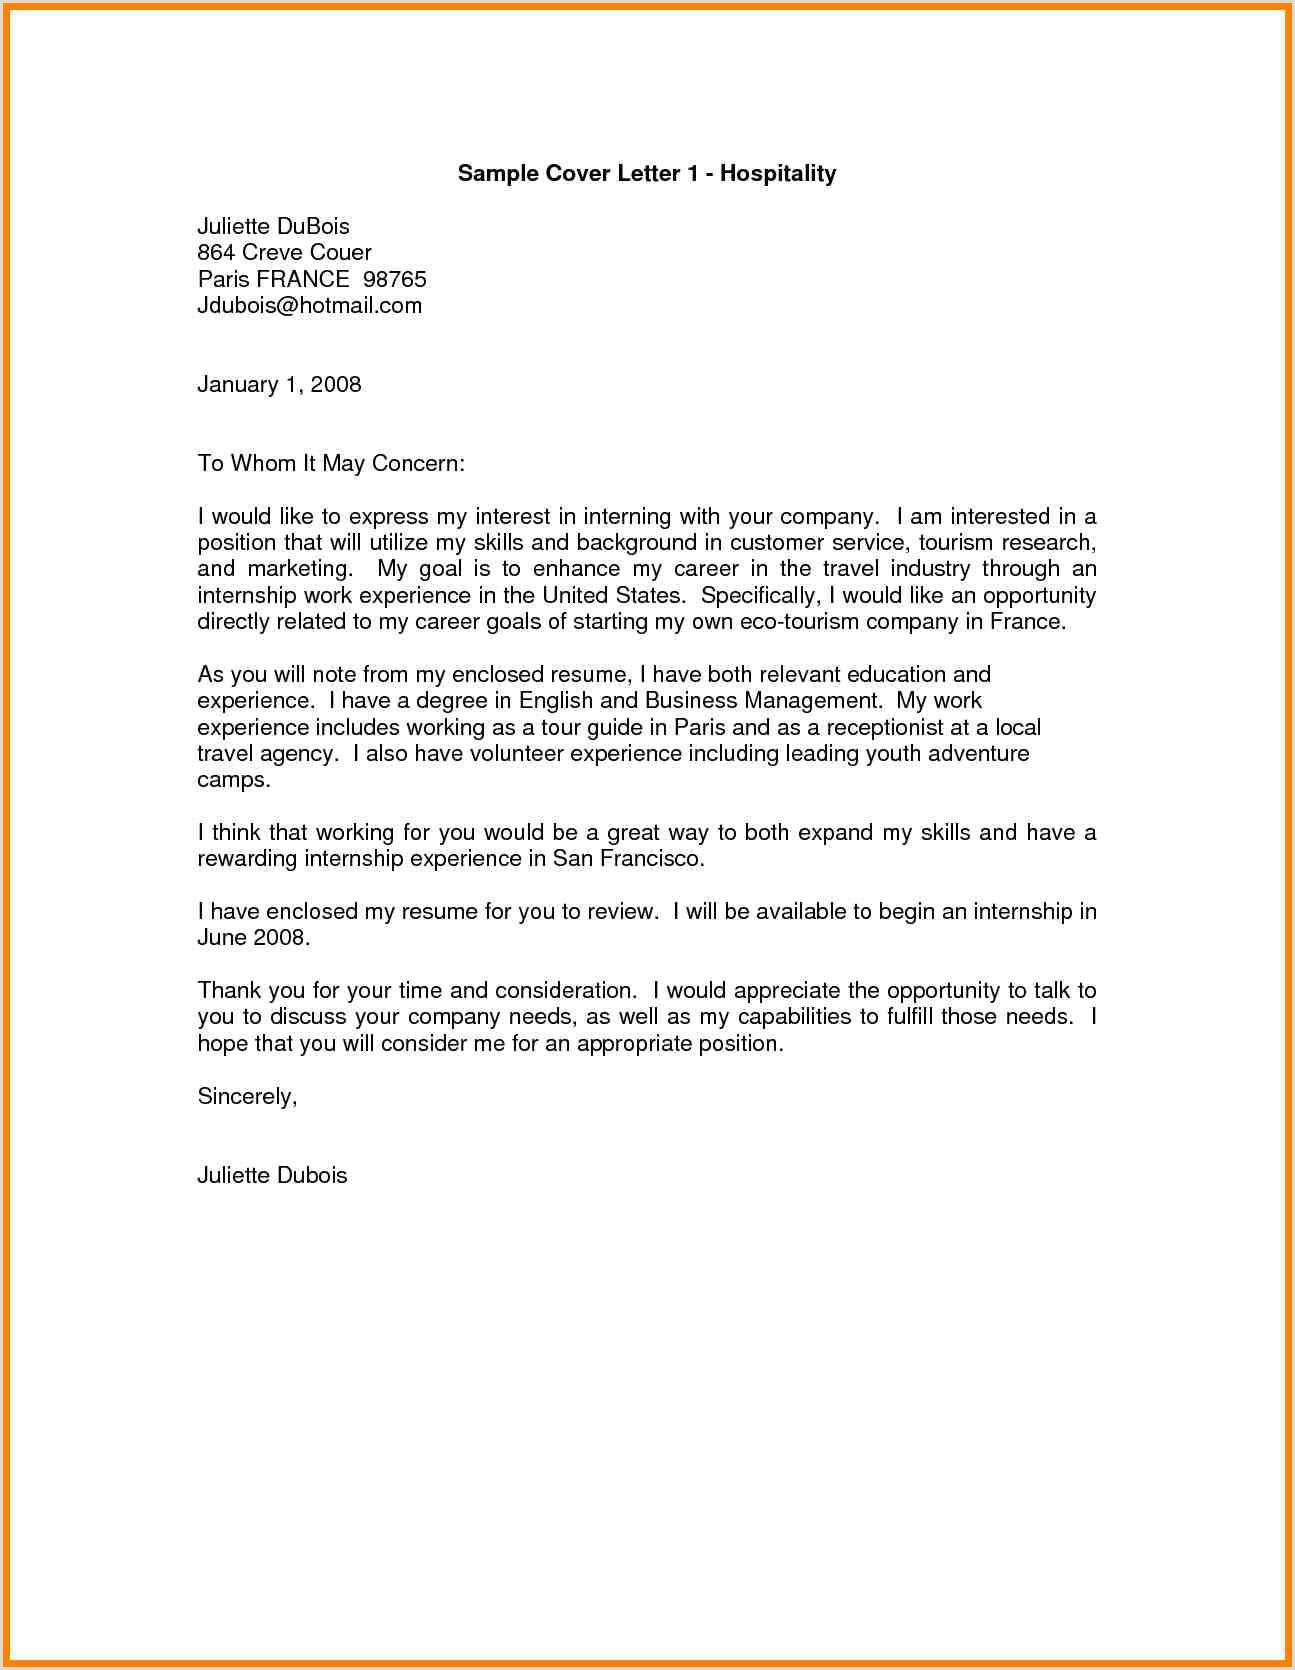 Hotel Cover Letter 8 9 Covering Letter for Hospitality